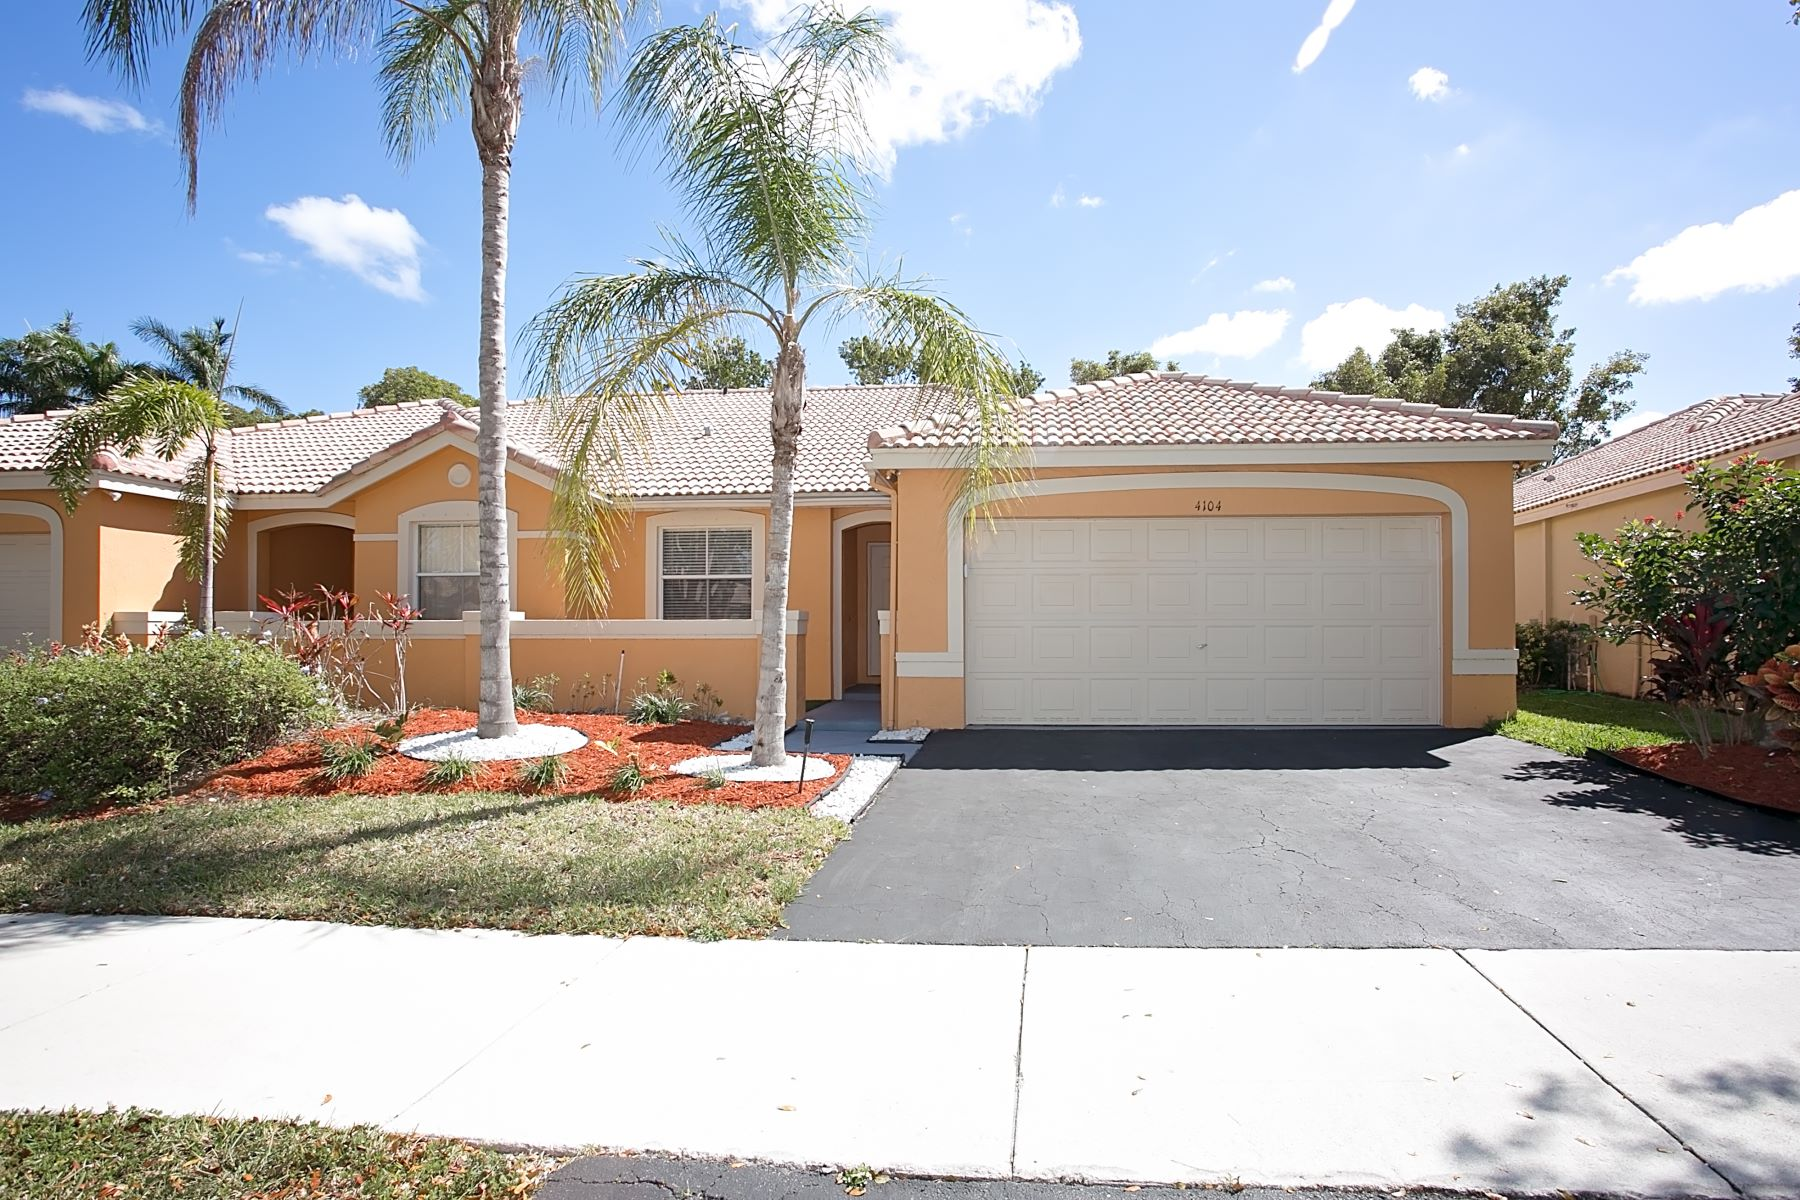 Single Family Home for Rent at 4104 Pine Ridge Ln 4104 Pine Ridge Ln Weston, Florida 33331 United States